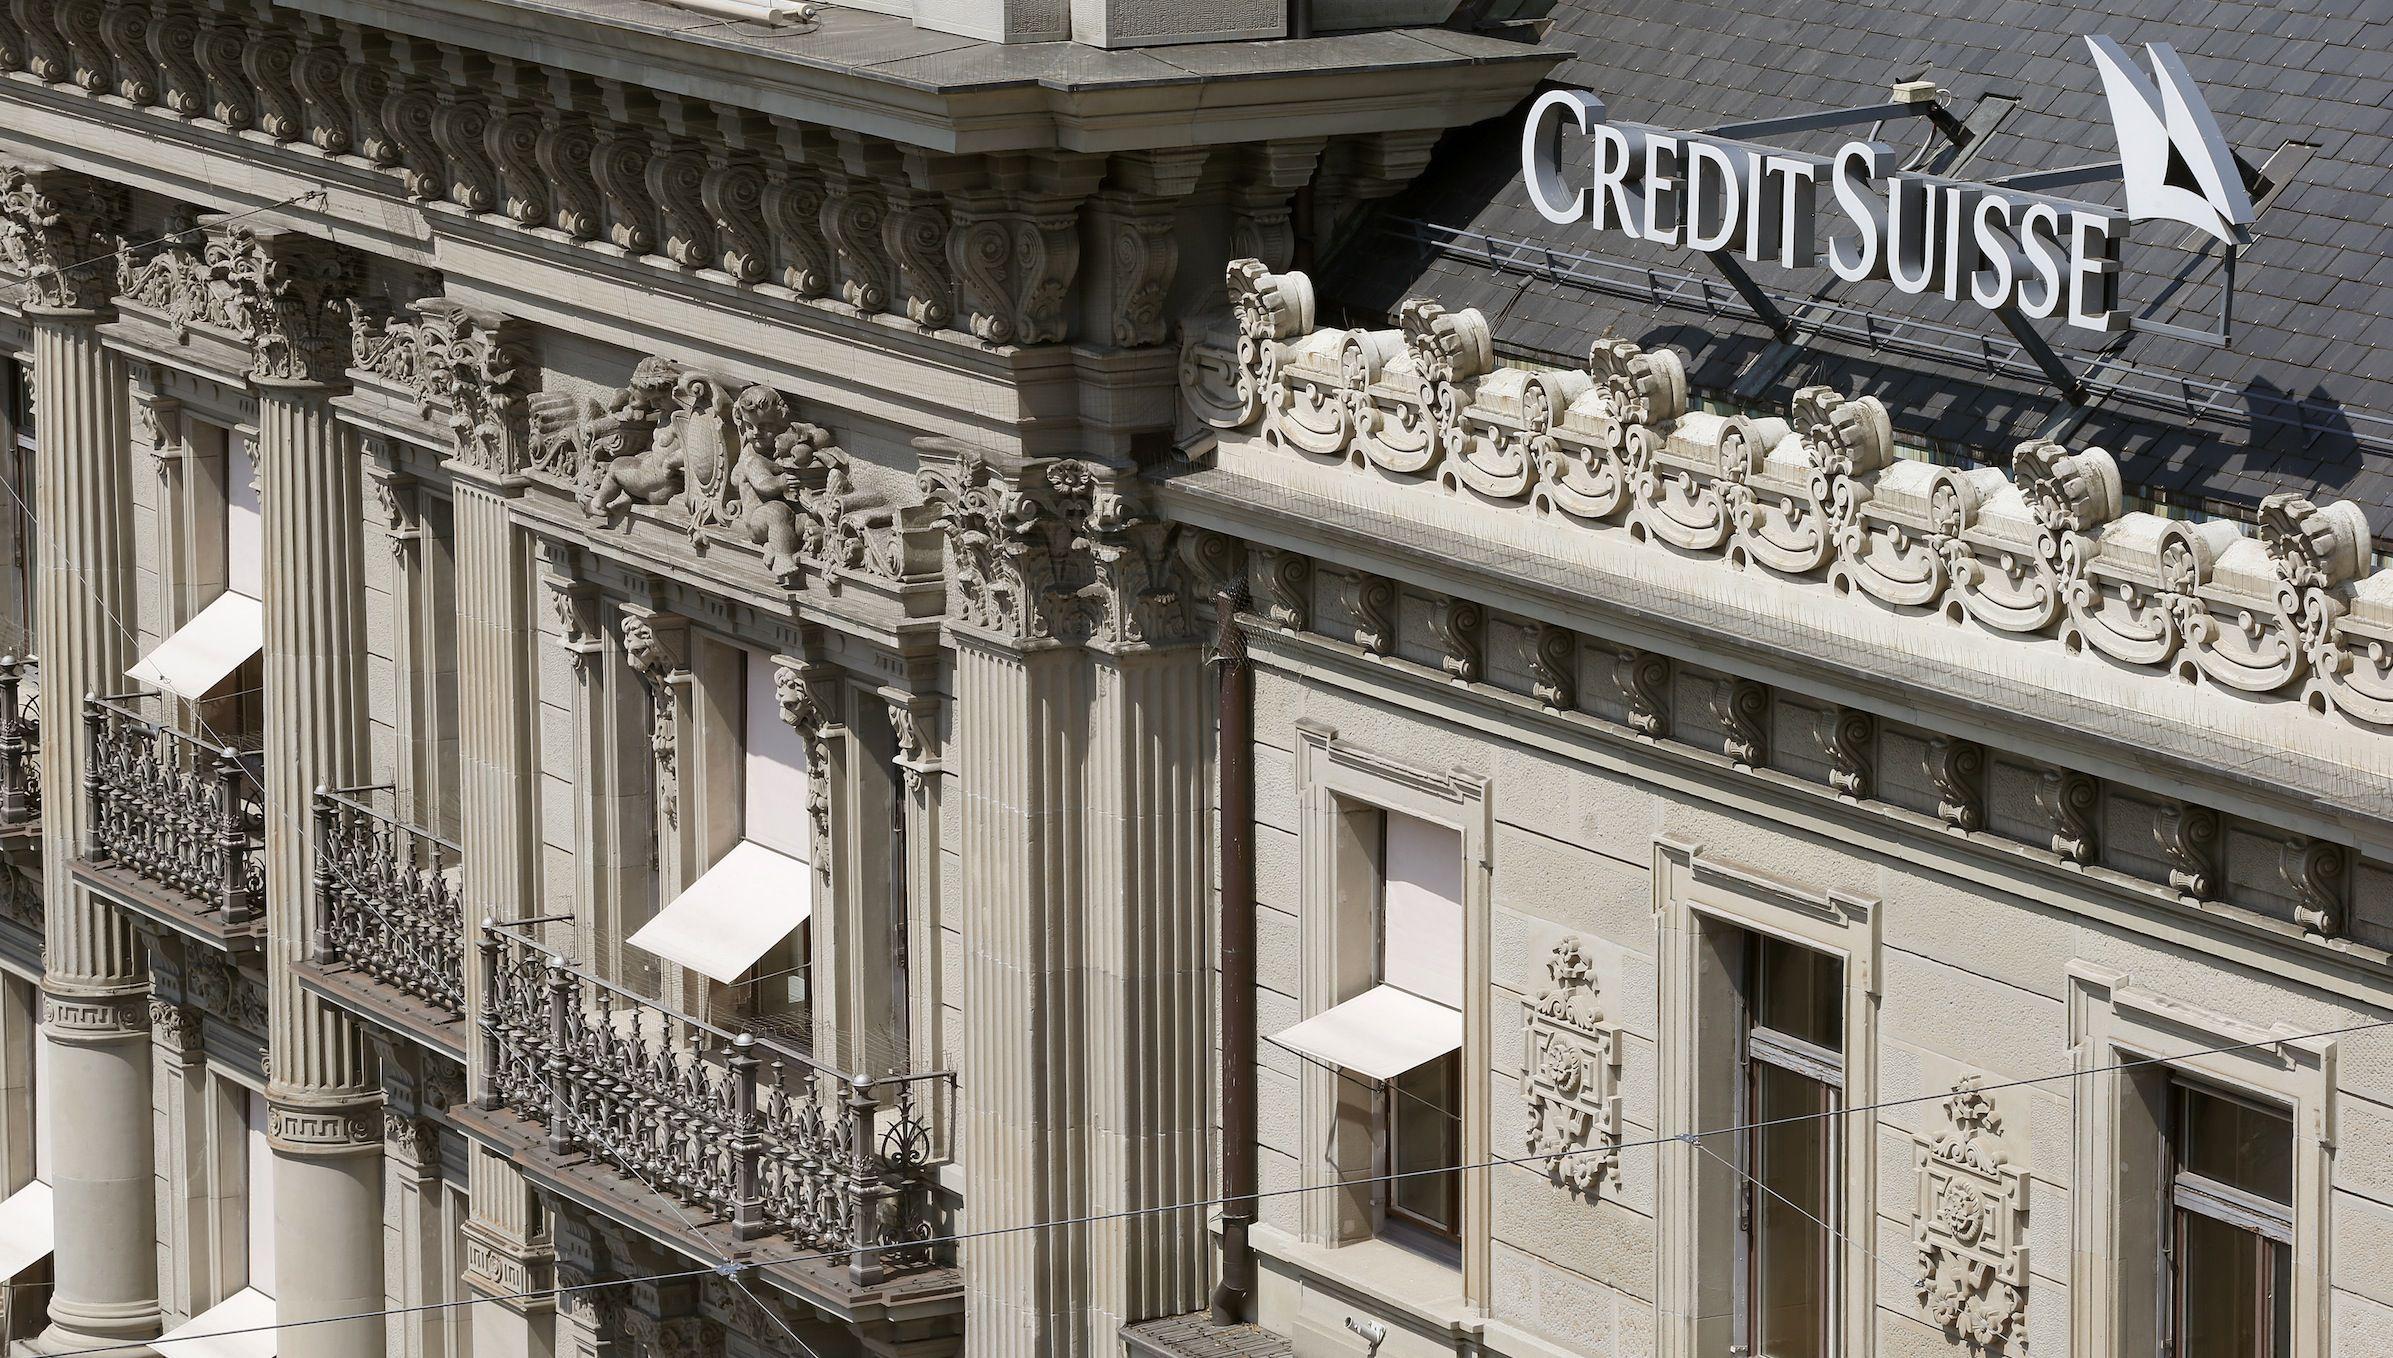 Credit Suisse office building